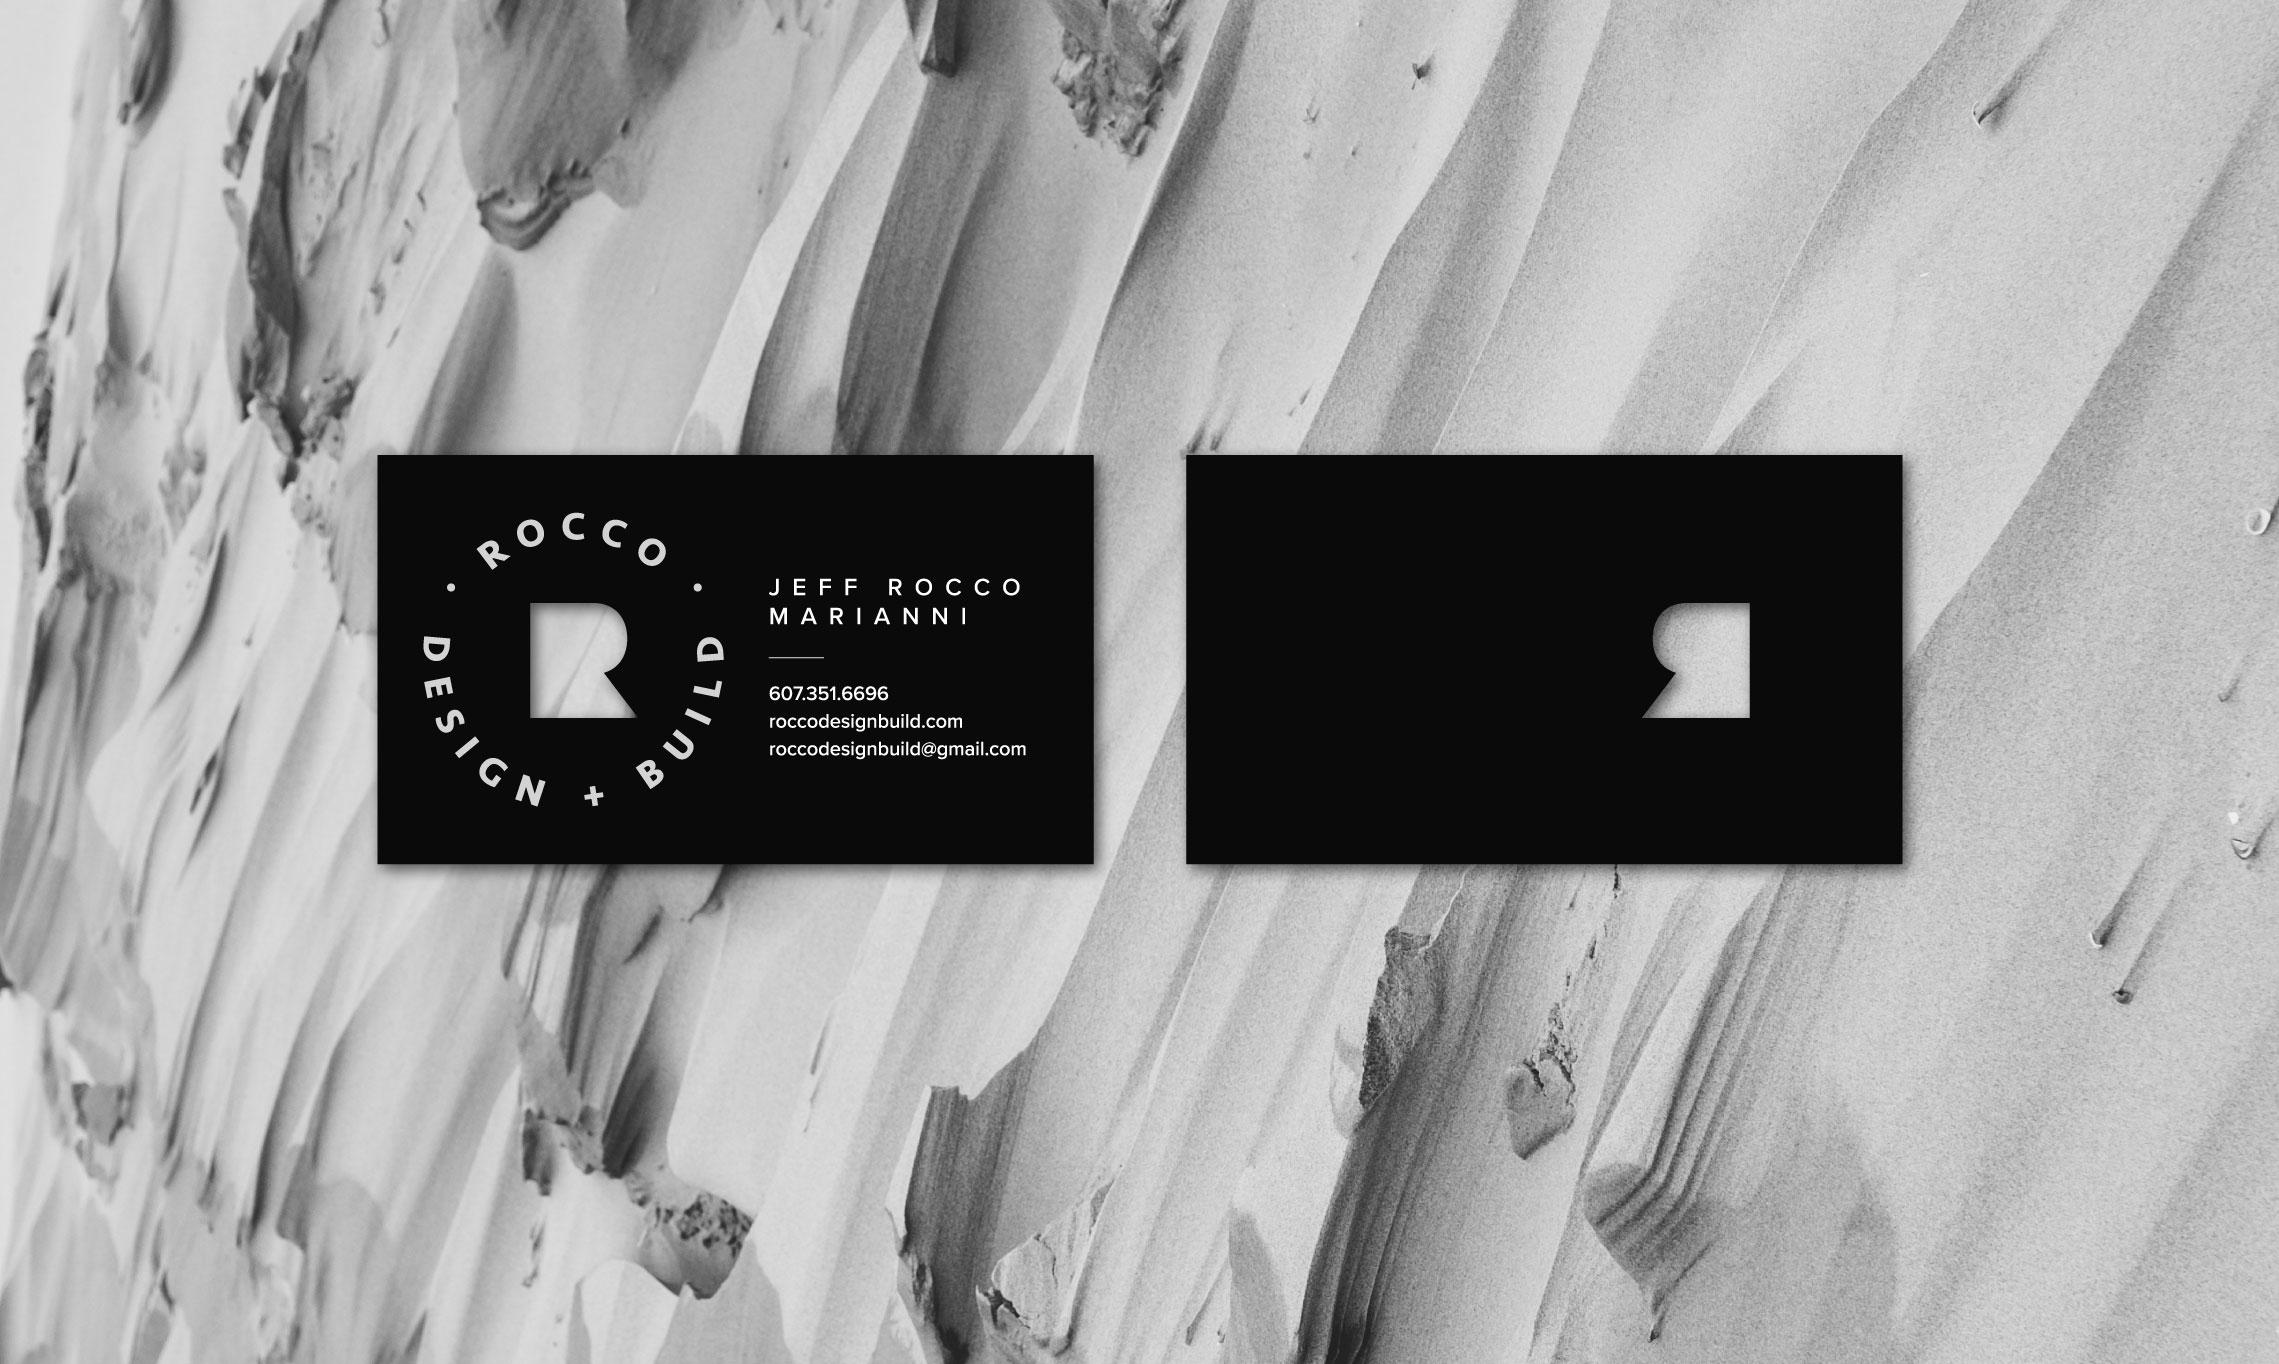 Ana-Juan-Gomez-branding-design-ROCCO.jpg